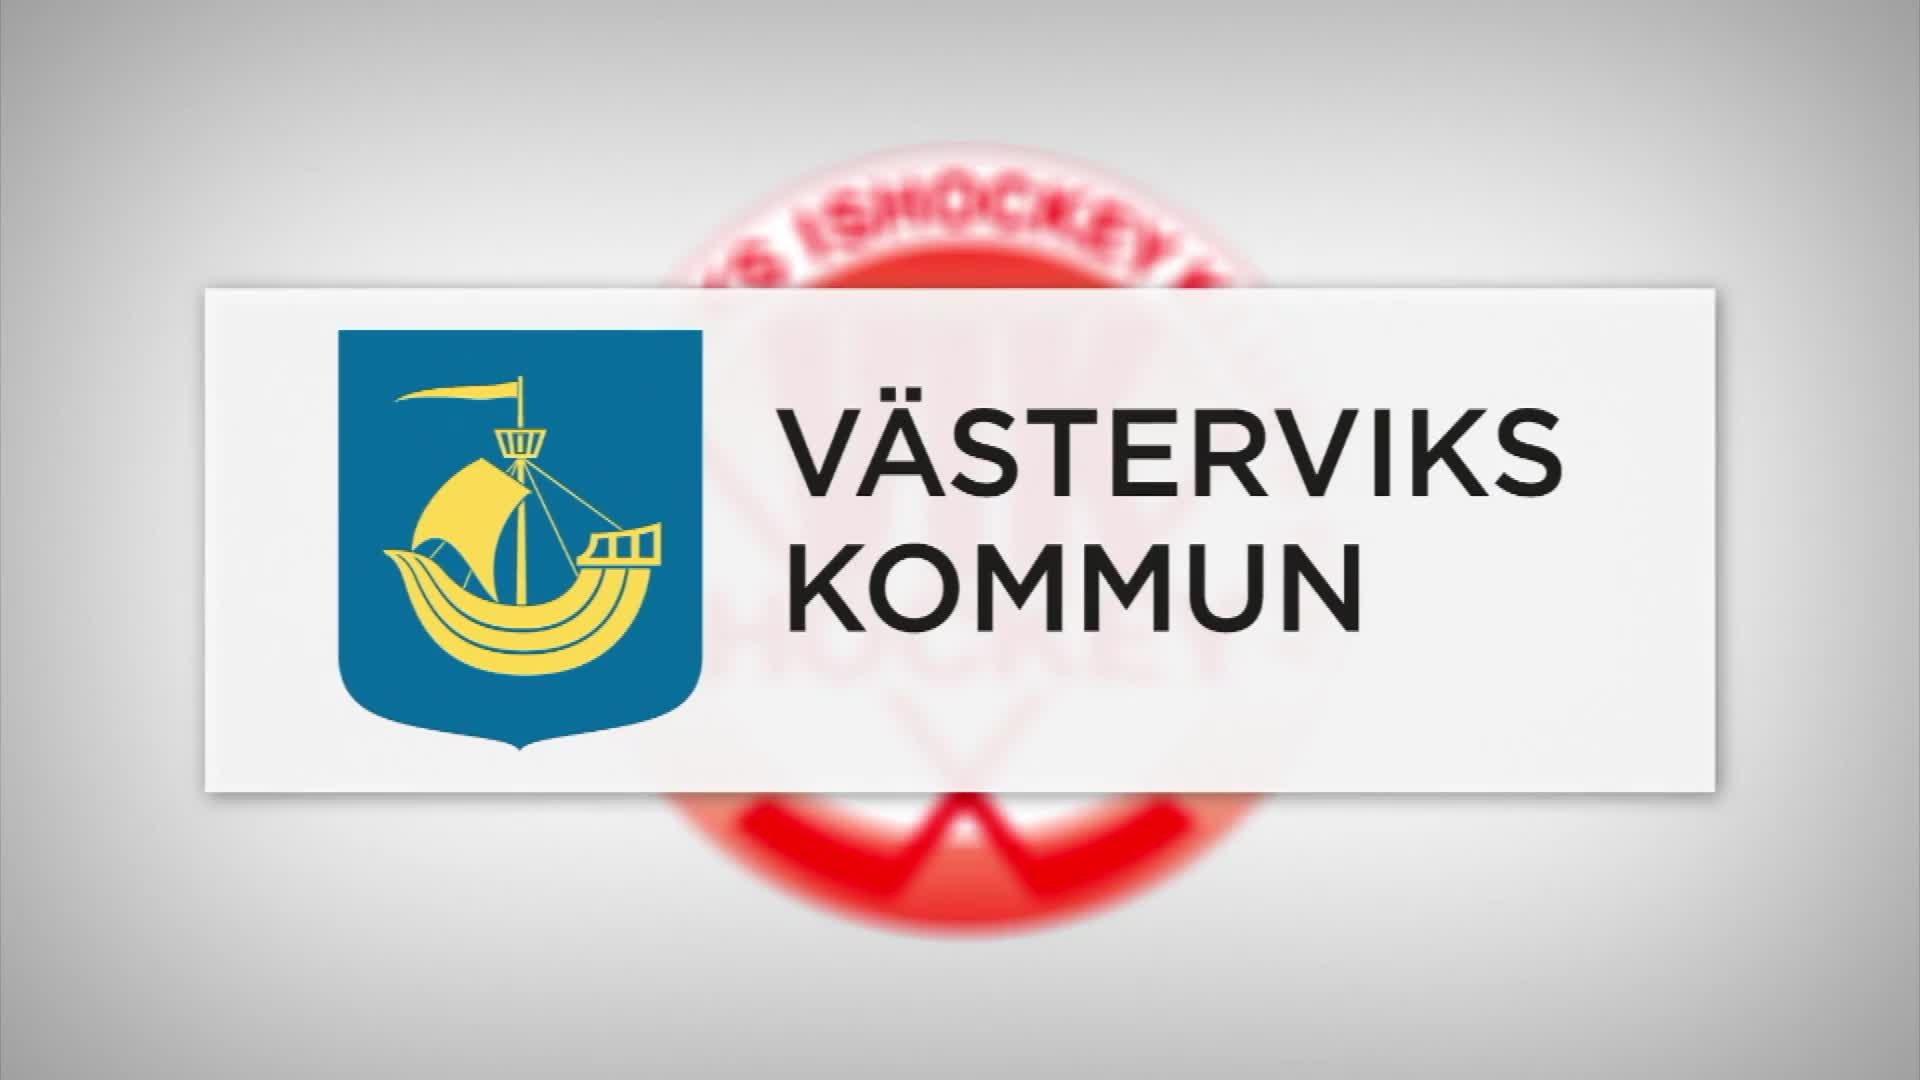 VIK-TV: Segerjubel efter VIK-Karlskoga 2-1 OT plus intervjuer Pettersson och Plant